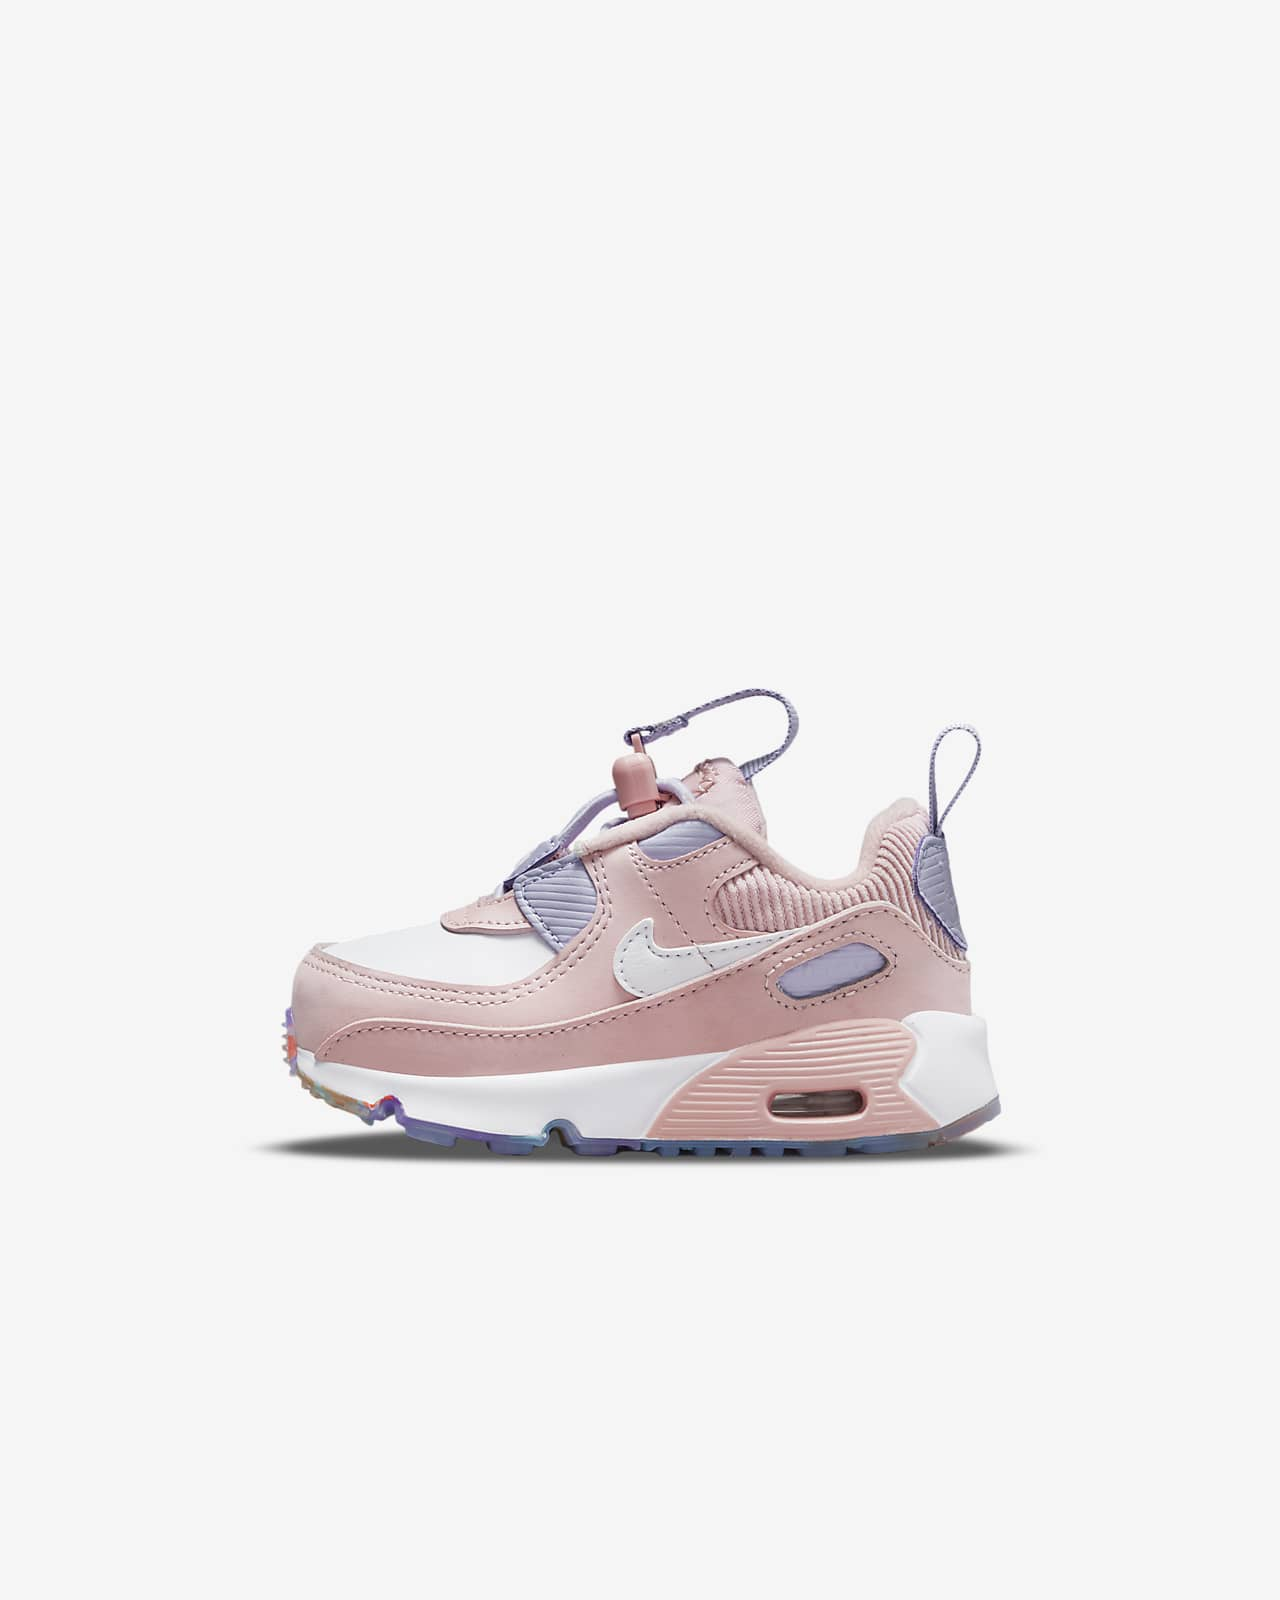 Nike Air Max 90 Toggle SE Baby & Toddler Shoe